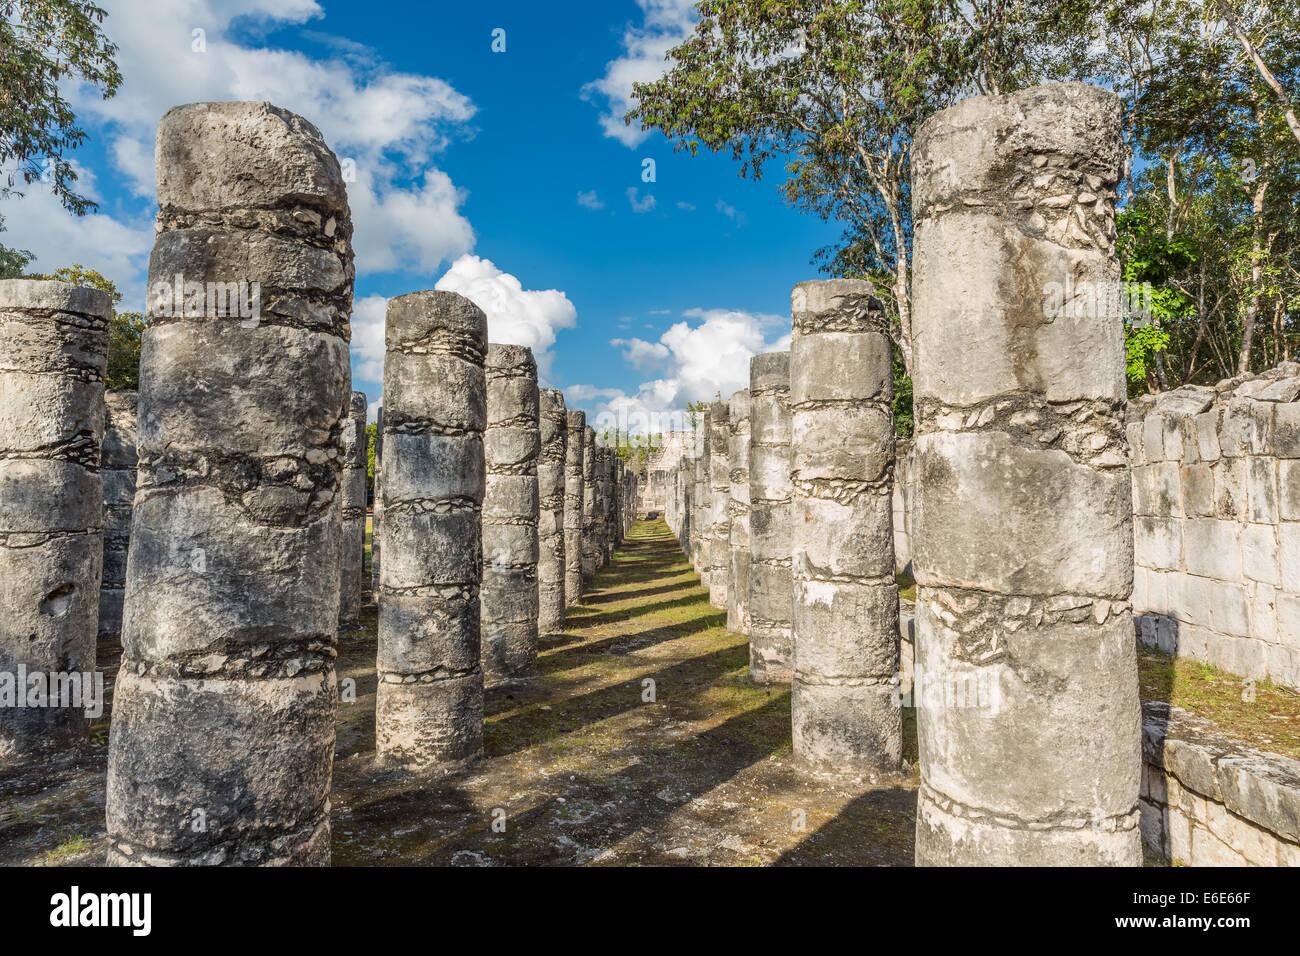 Templo de mil guerreros, Chichen Itza, México Imagen De Stock